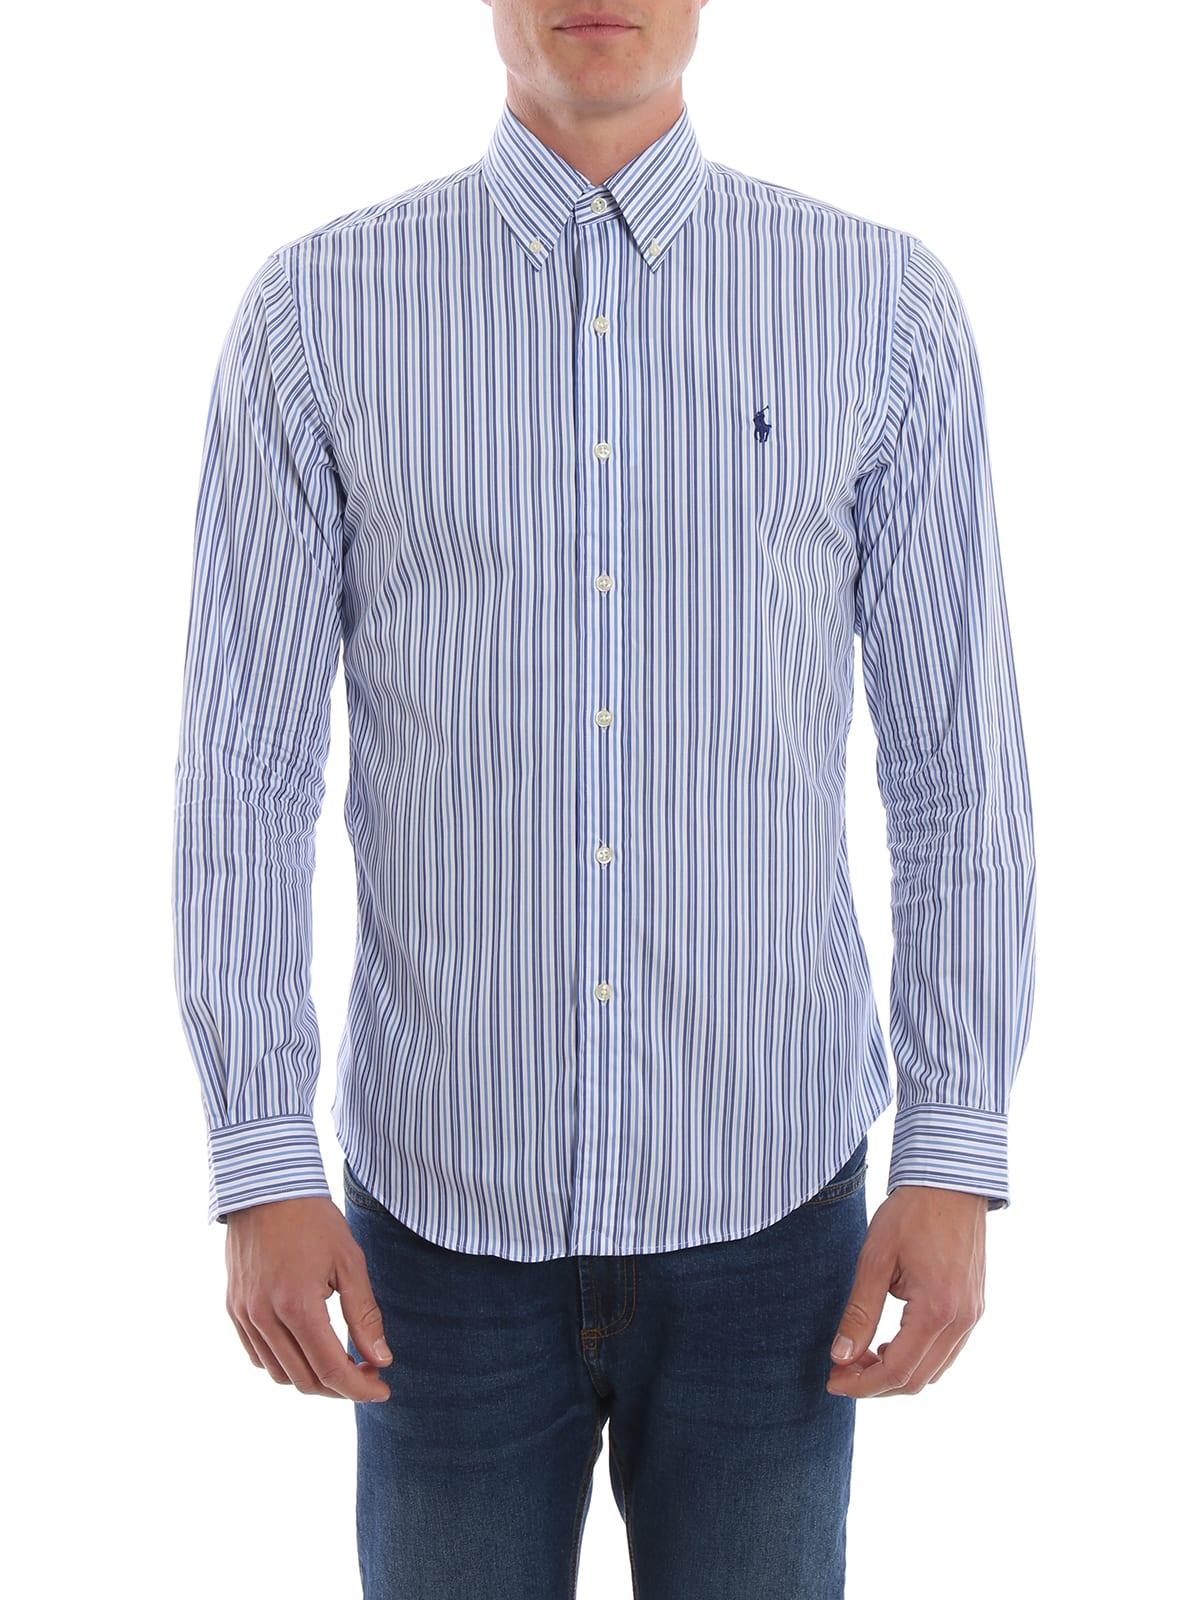 finest selection 84a21 4535d Polo Ralph Lauren Polo Ralph Lauren Camicia A Quadri In ...